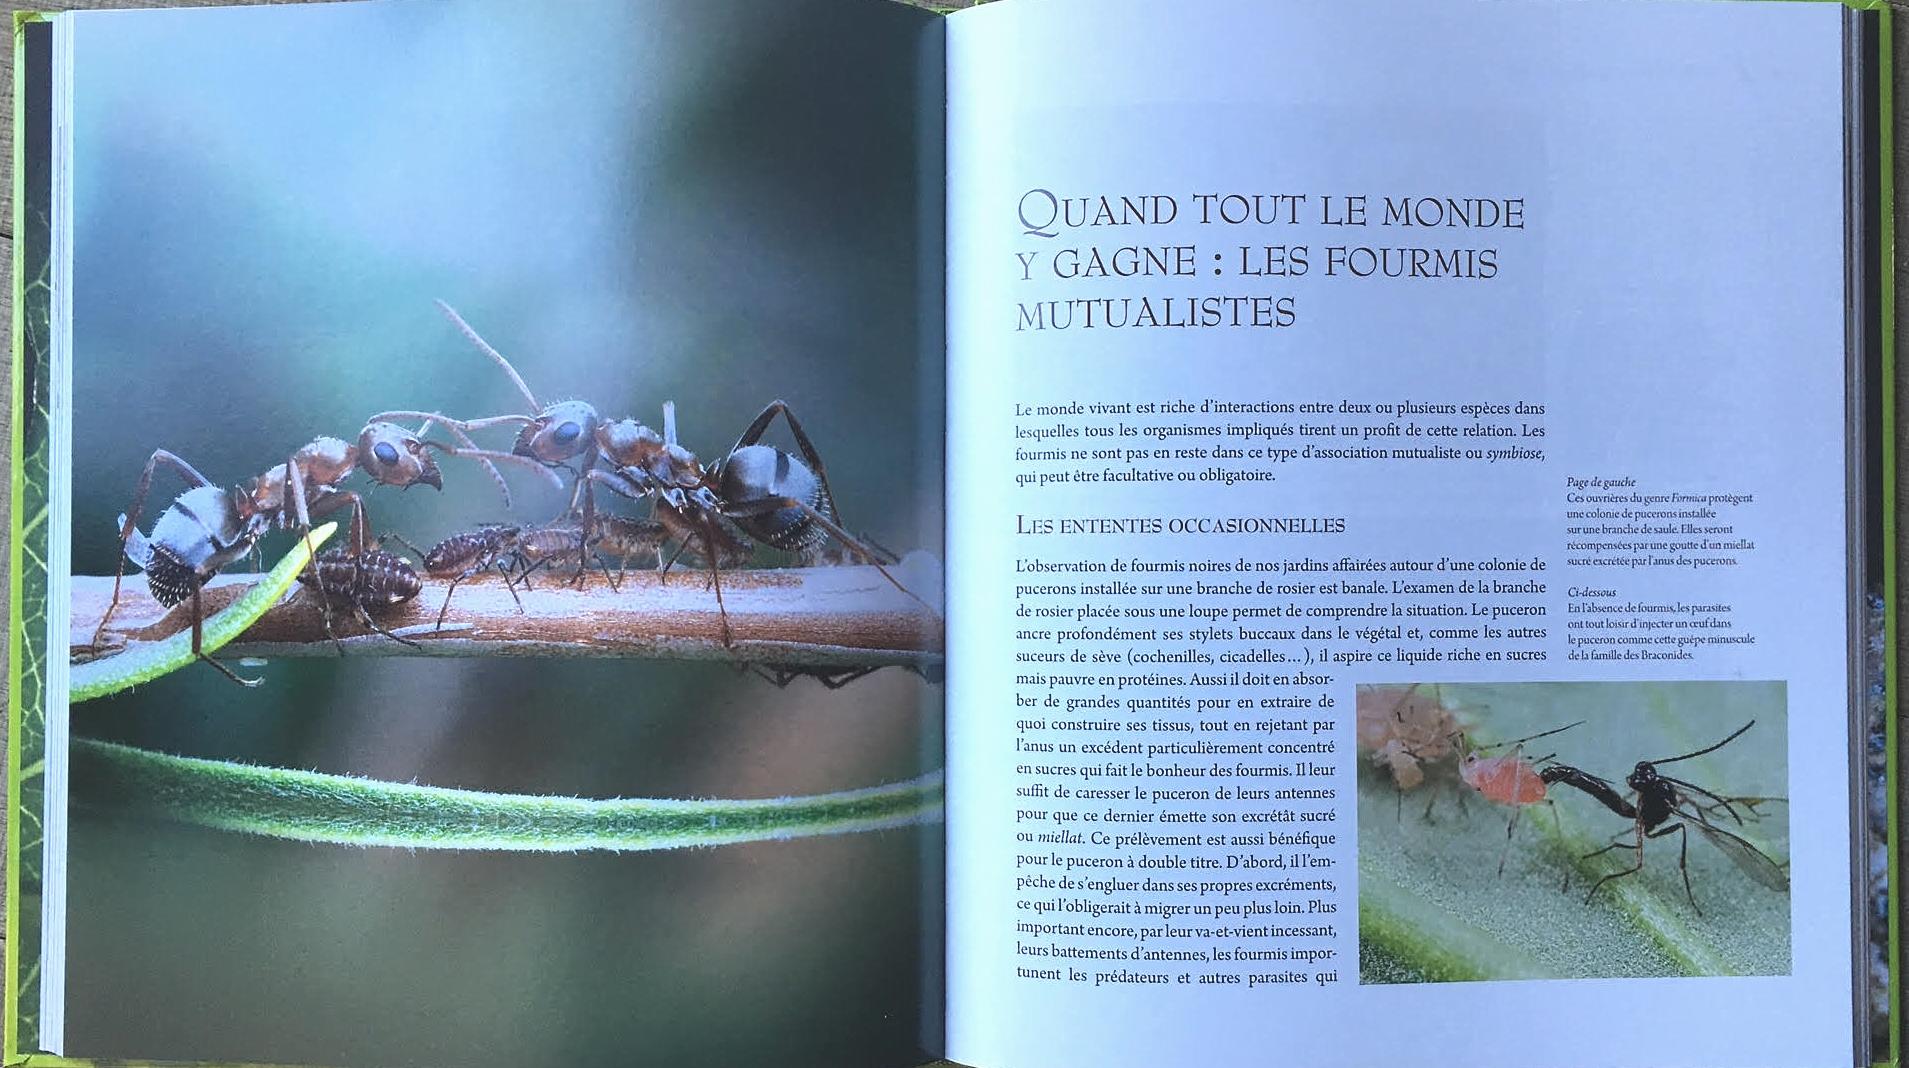 Eloigner Les Fourmis Au Jardin formidables fourmis - faune sauvage